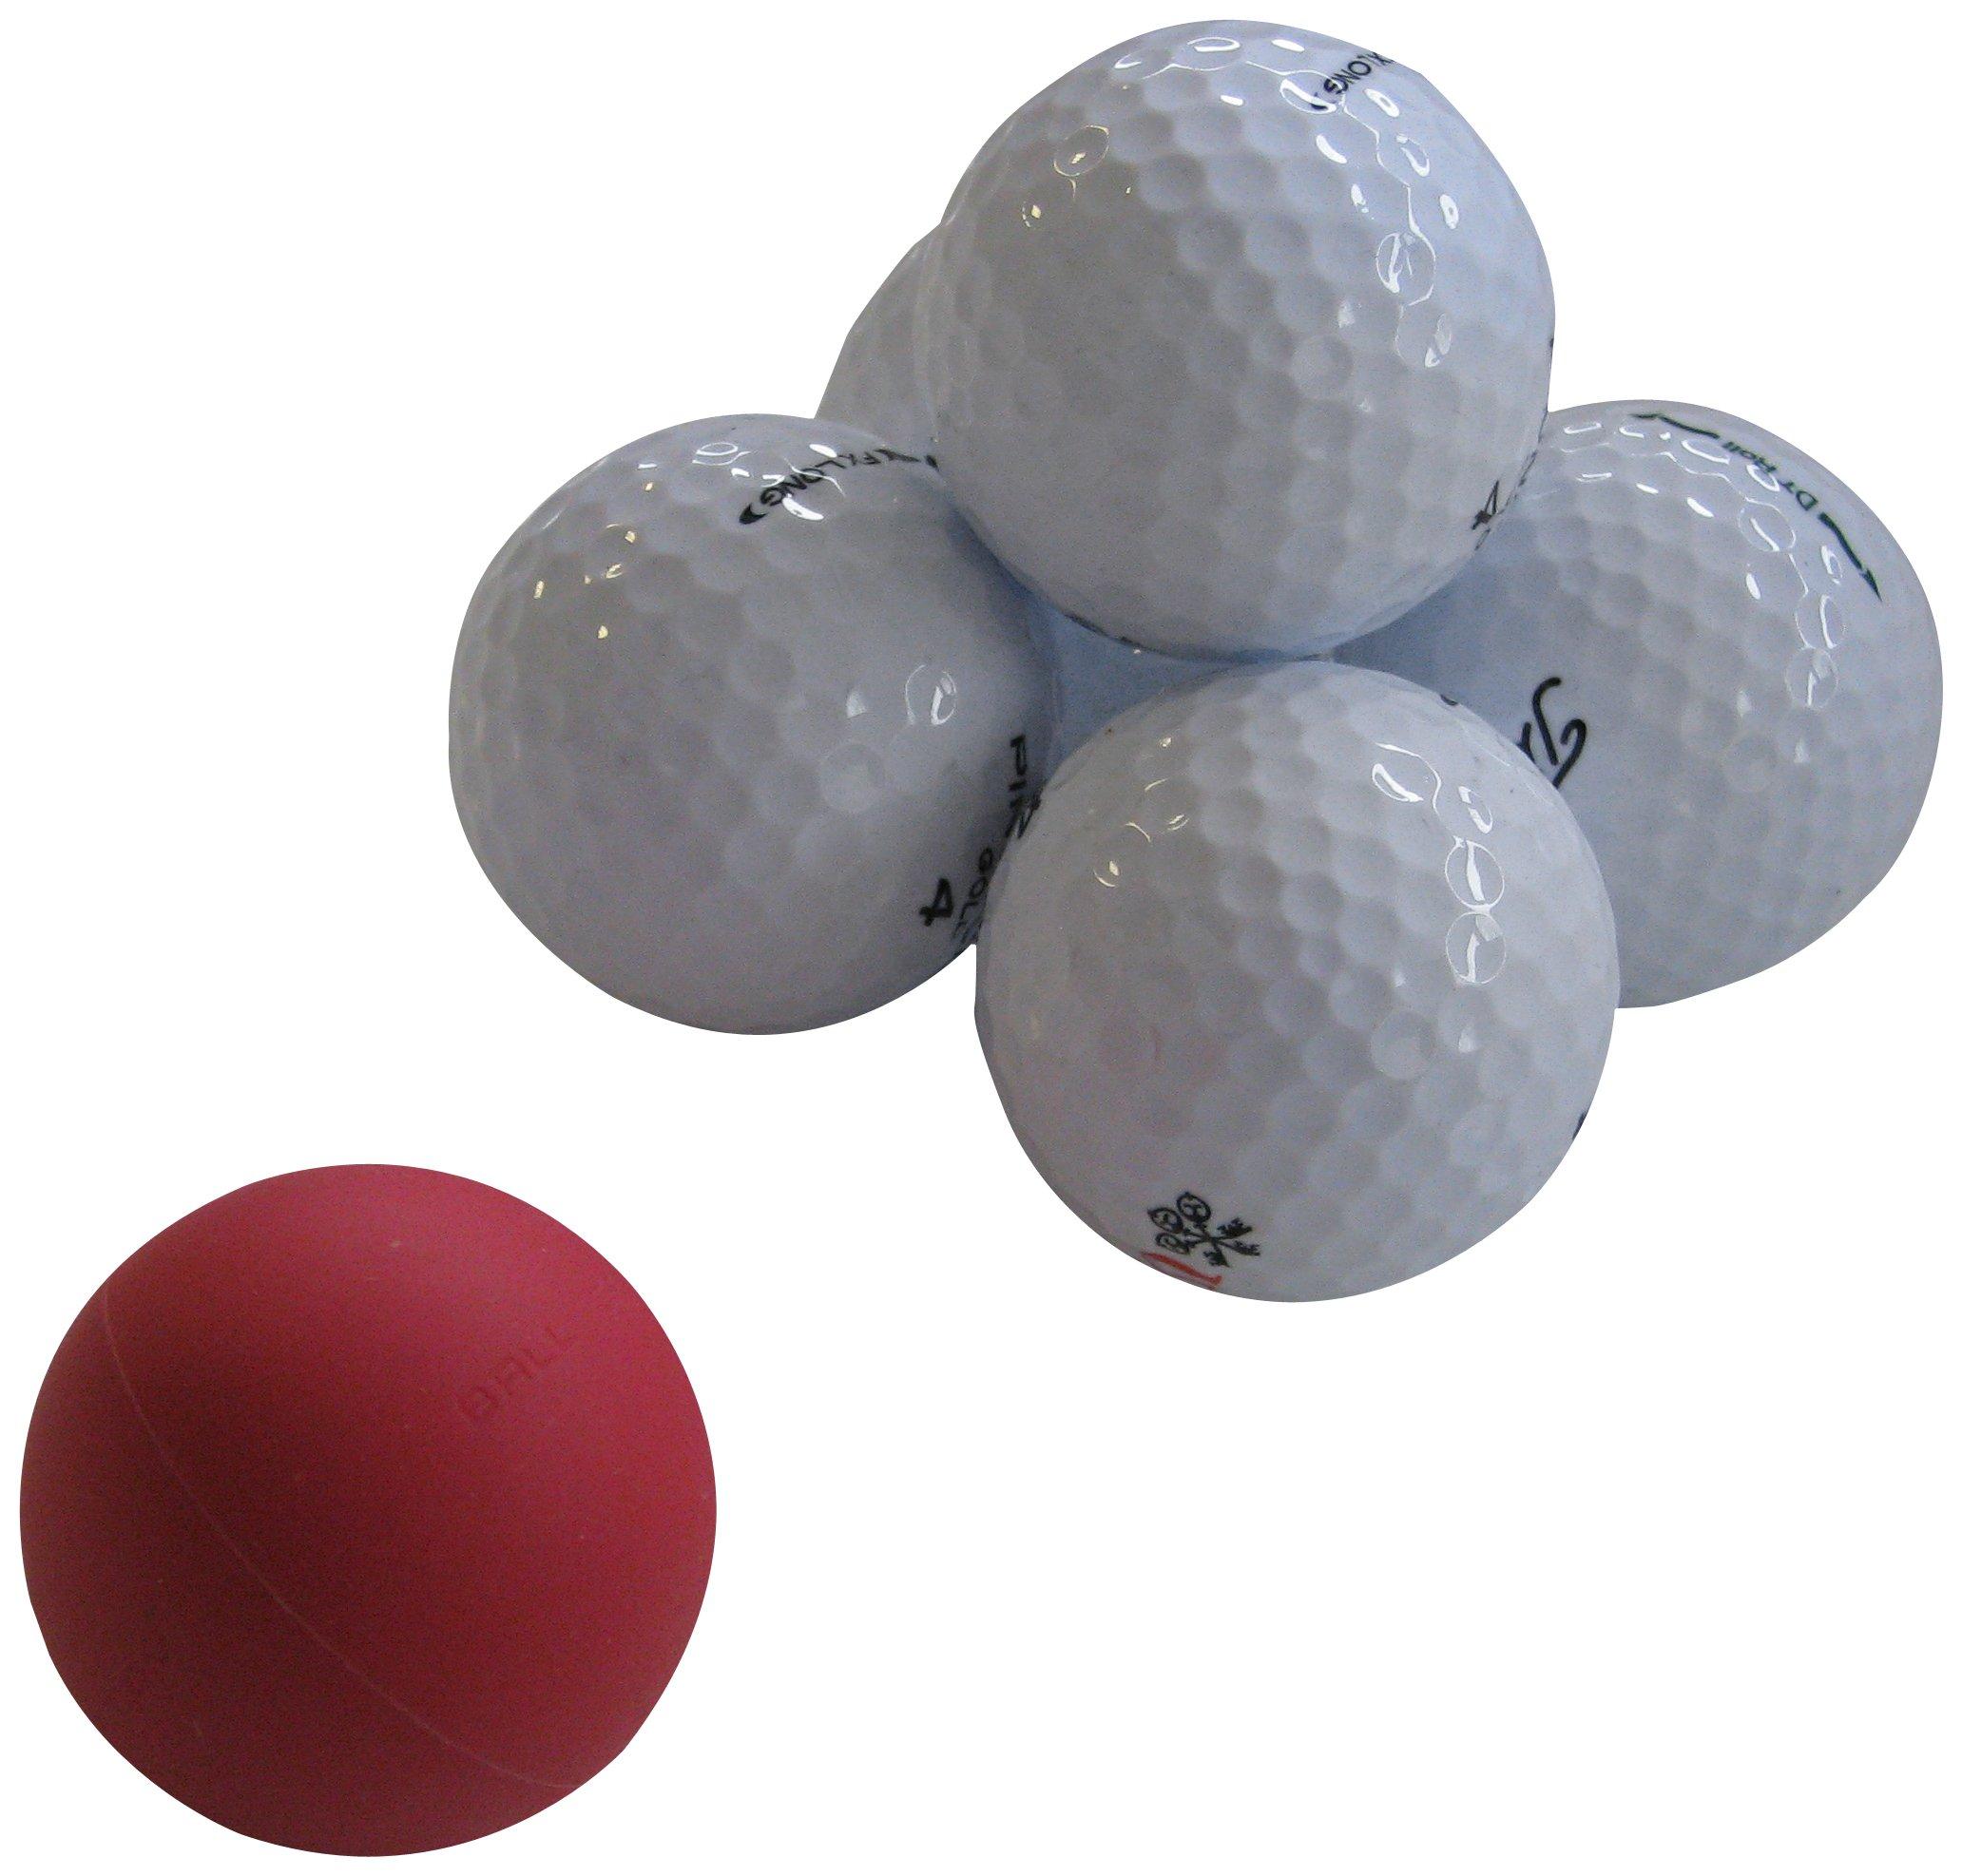 EyeLine Golf Ball of Steel (3-Pack) by EyeLine Golf